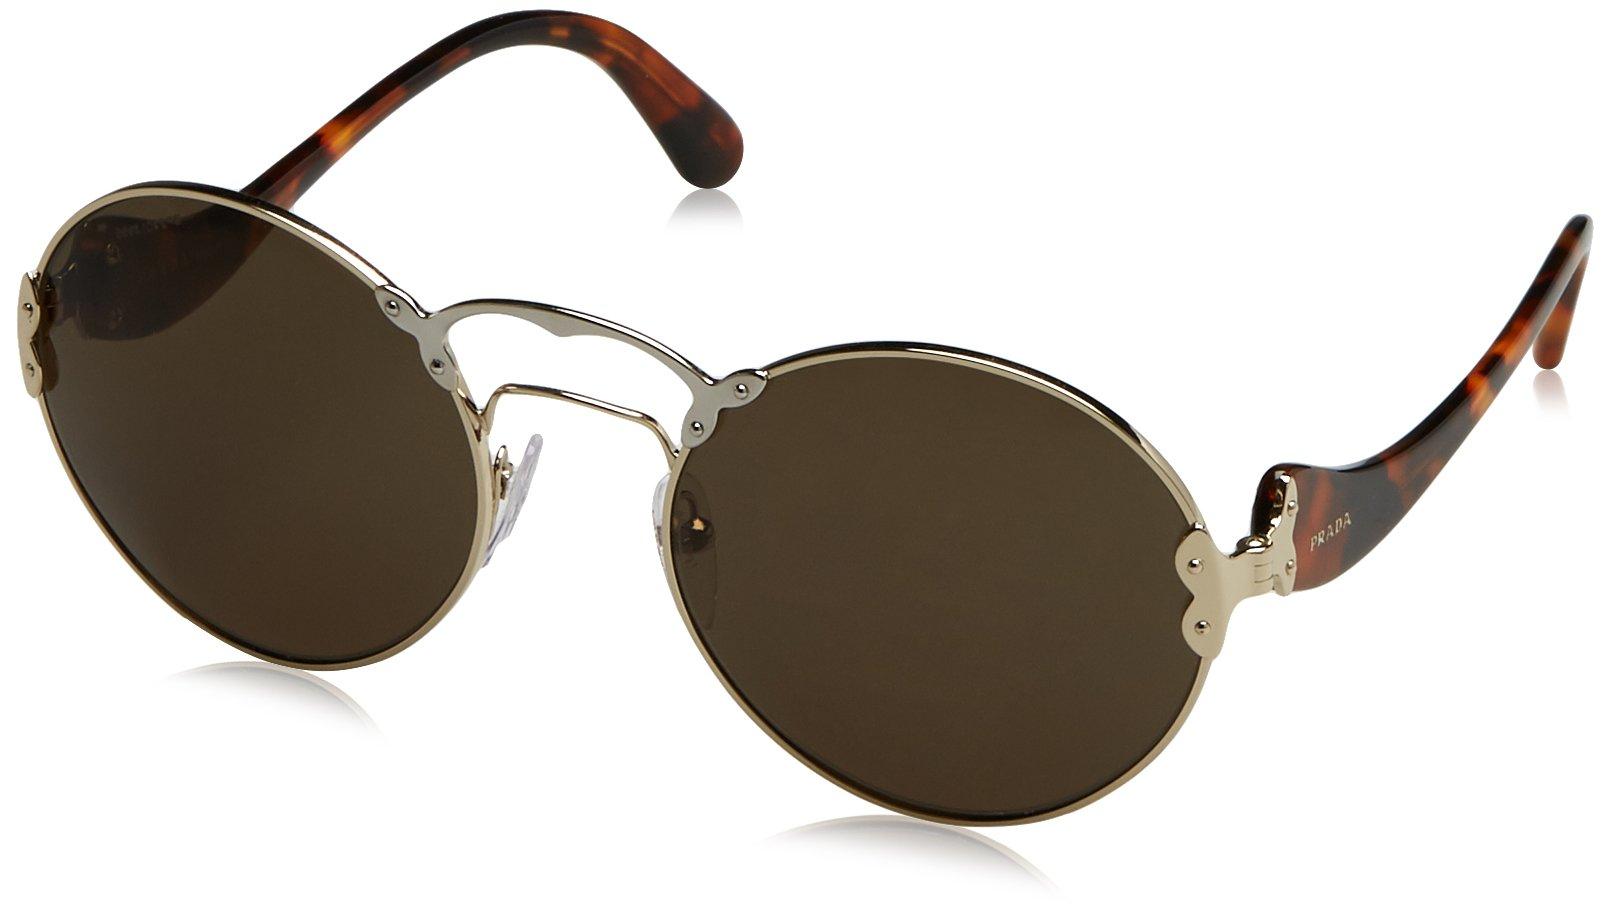 Prada Women's 0PR 55TS Pale Gold/Silver/Green Sunglasses, 57mm